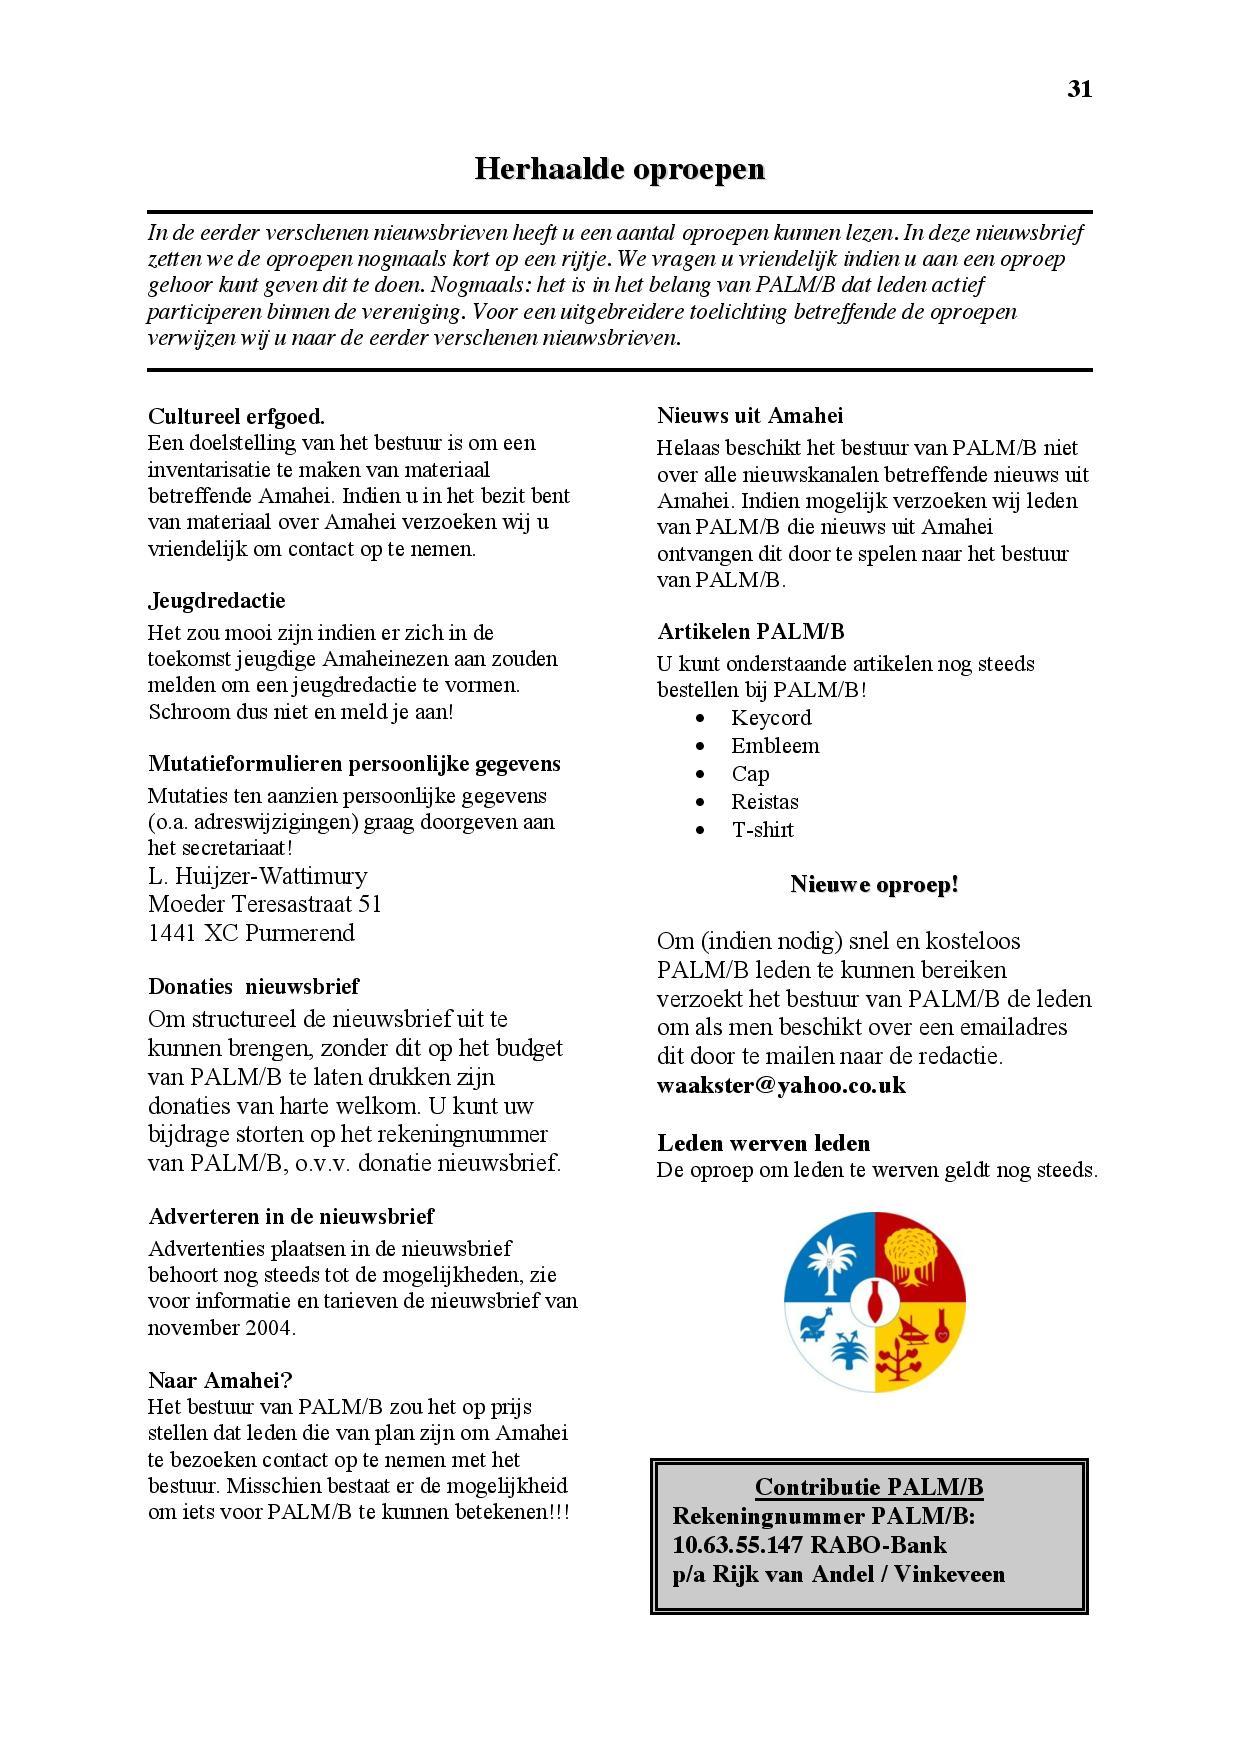 Saka Mese 3e jaargang nr. 02-2007 definitieve webversie-page-031